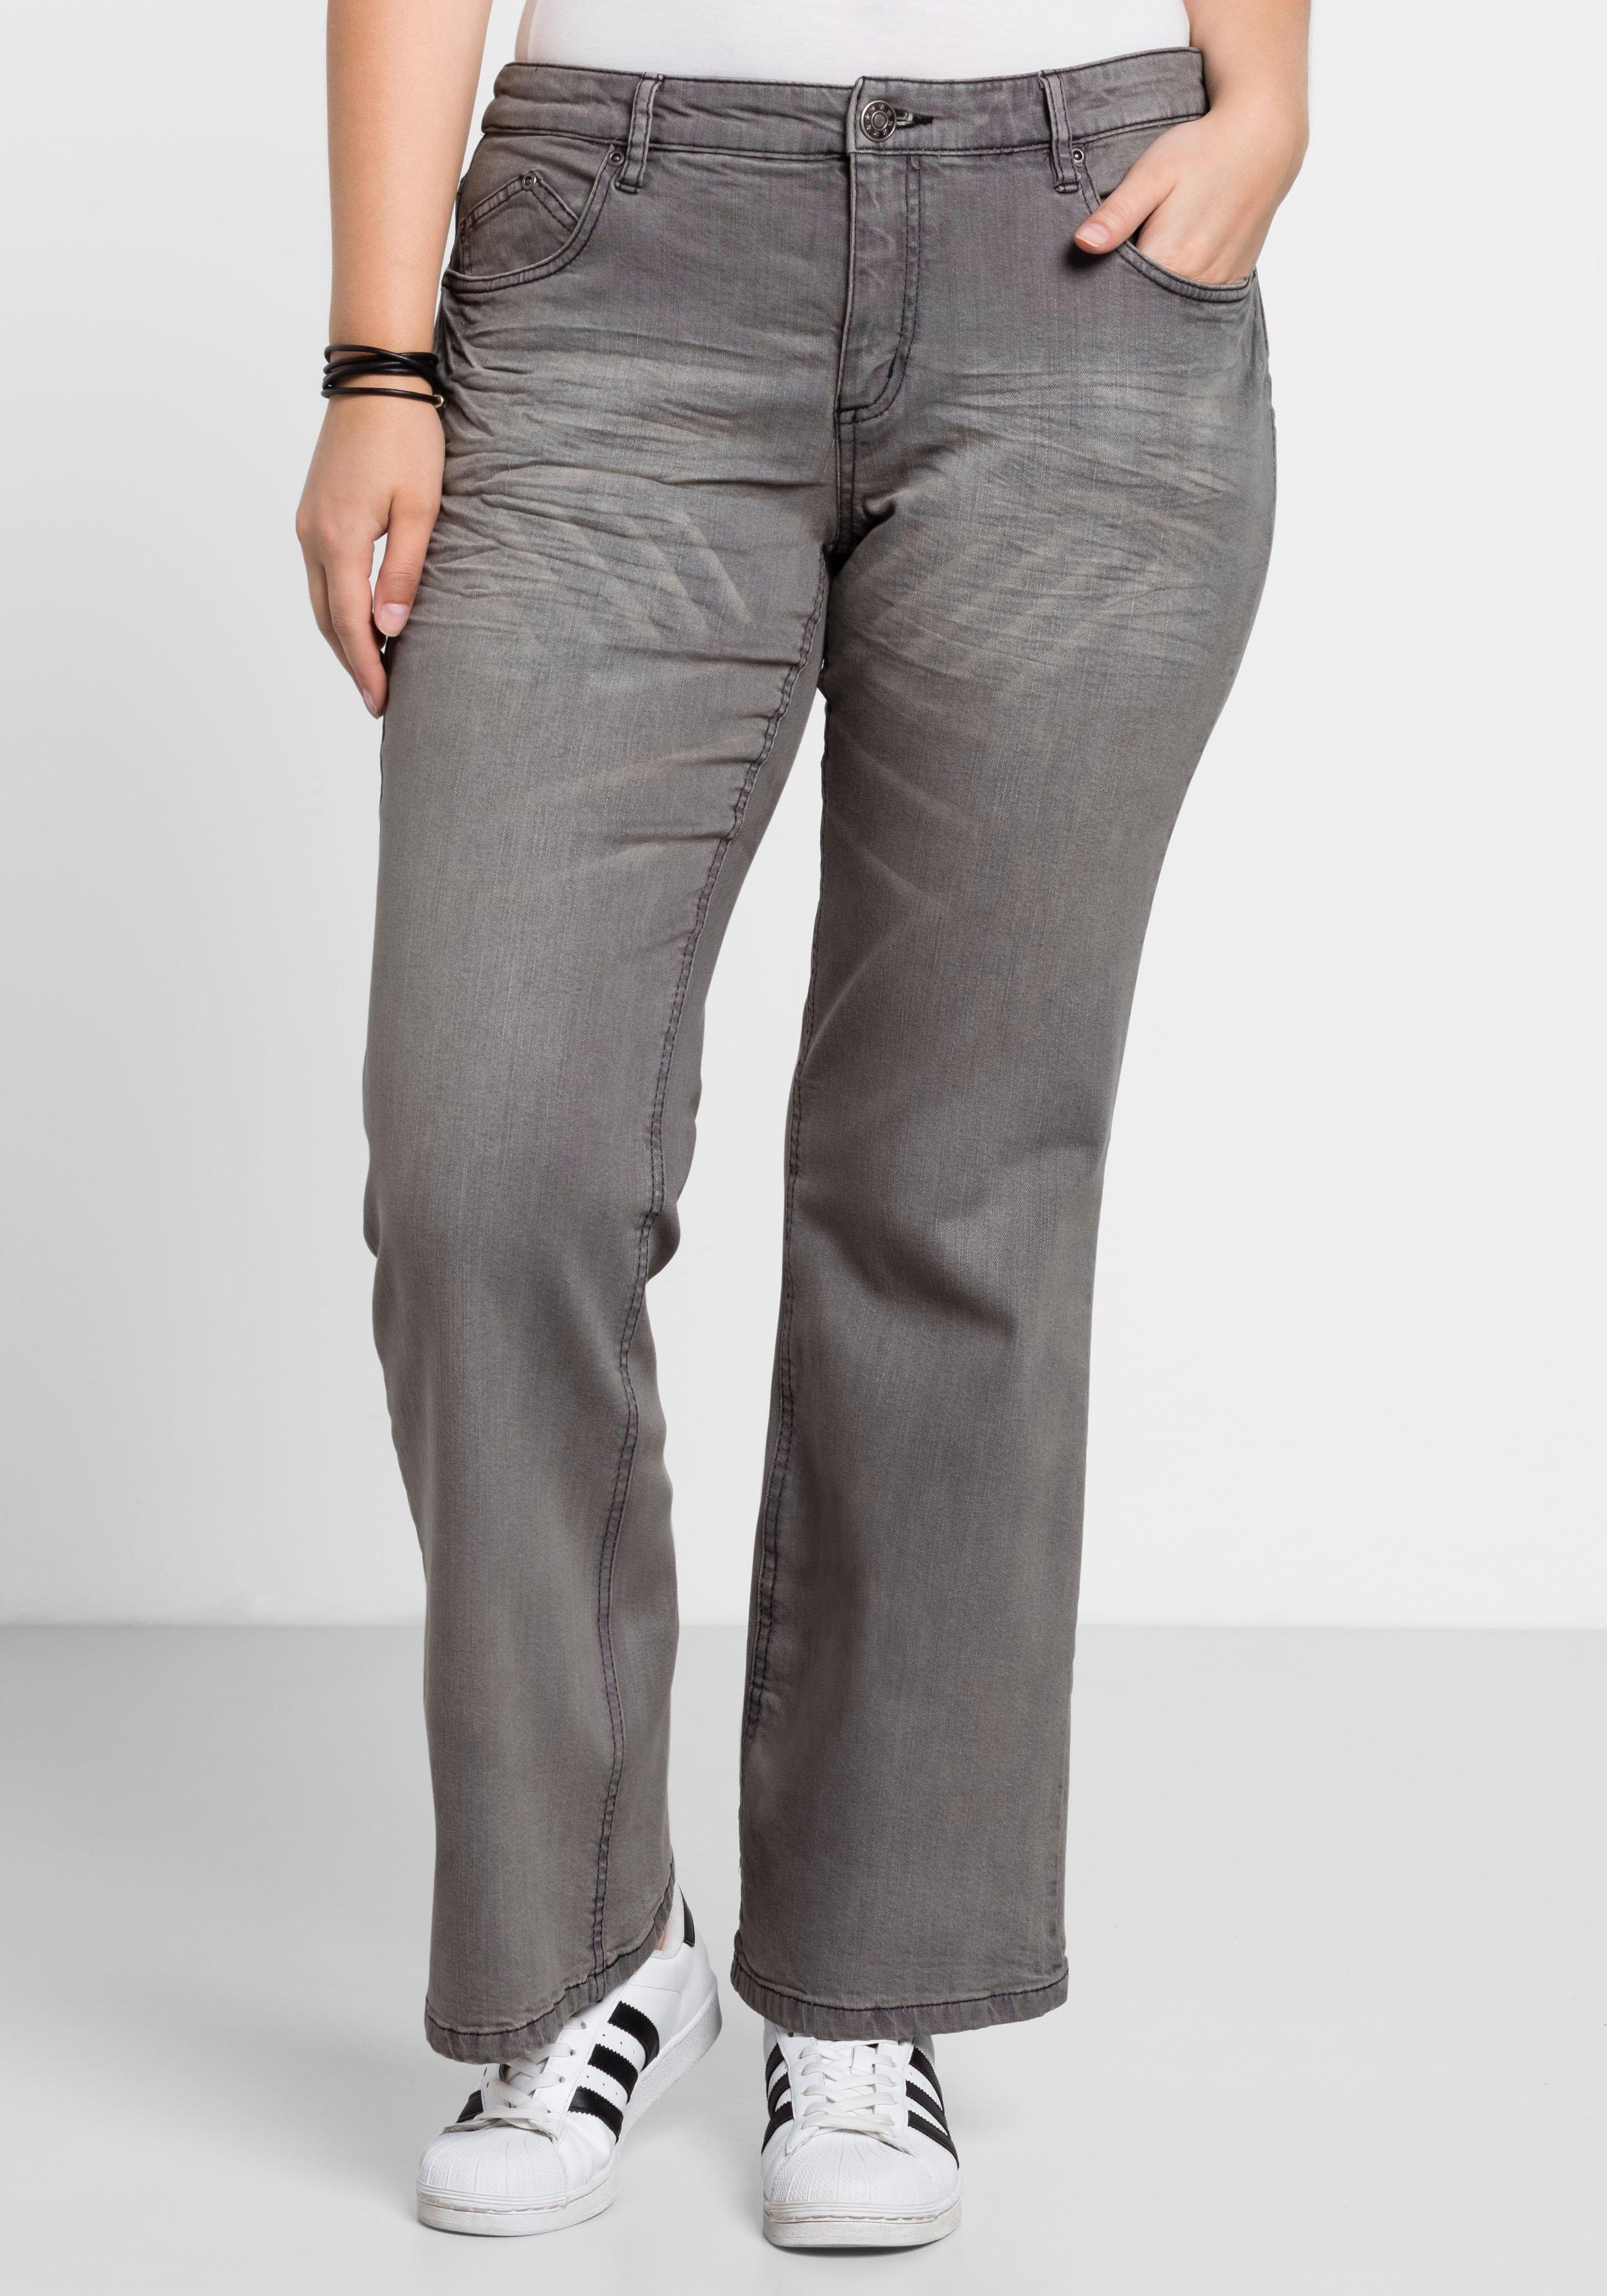 Sheego Denim sheego Denim stretchjeans in bootcutmodel voordelig en veilig online kopen